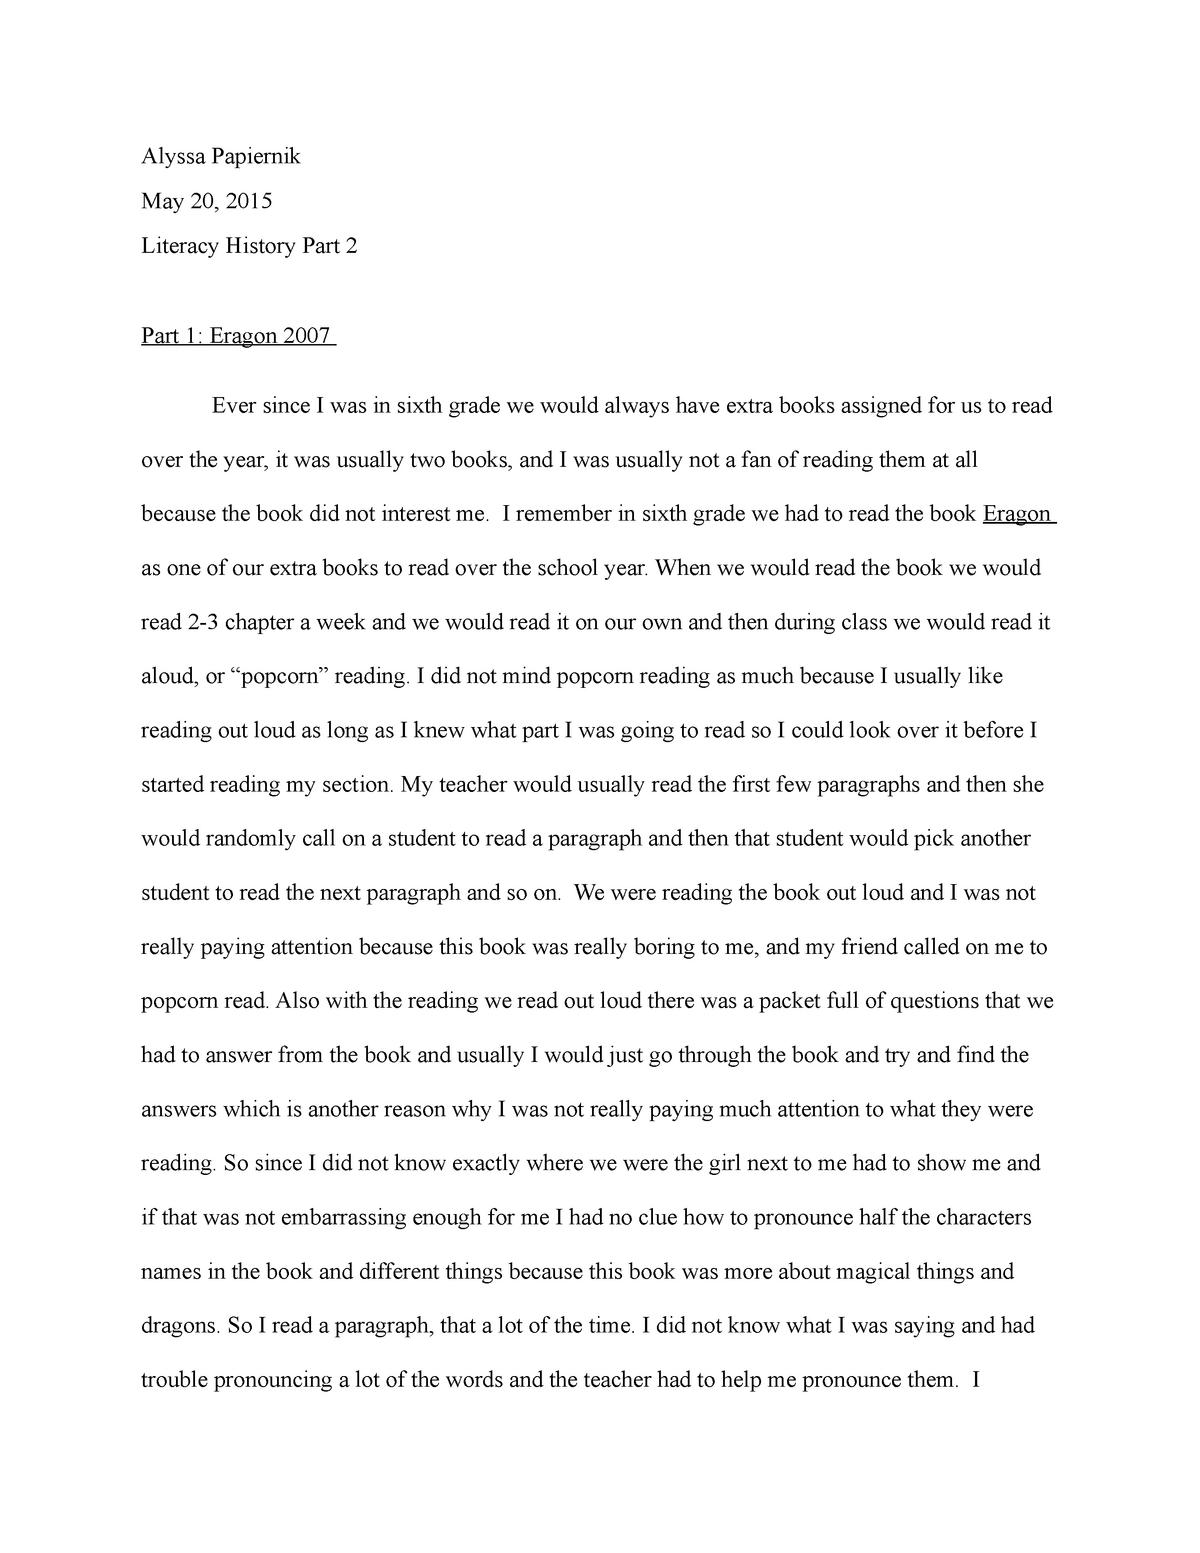 TCH 208 Literacy History part 2 - TCH 208: Literacy I